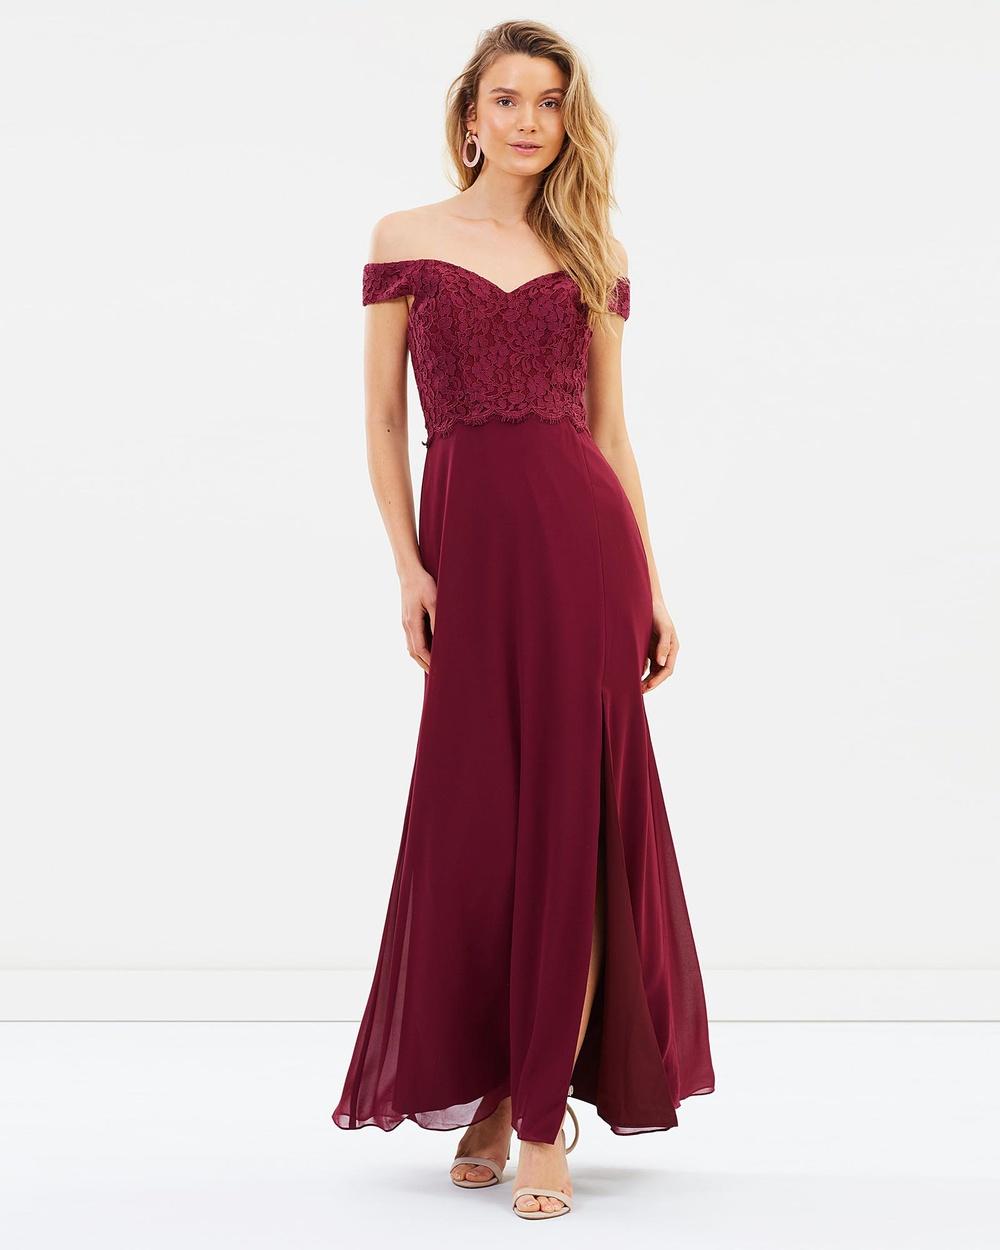 Alabaster The Label Merlot Red Solace Dress